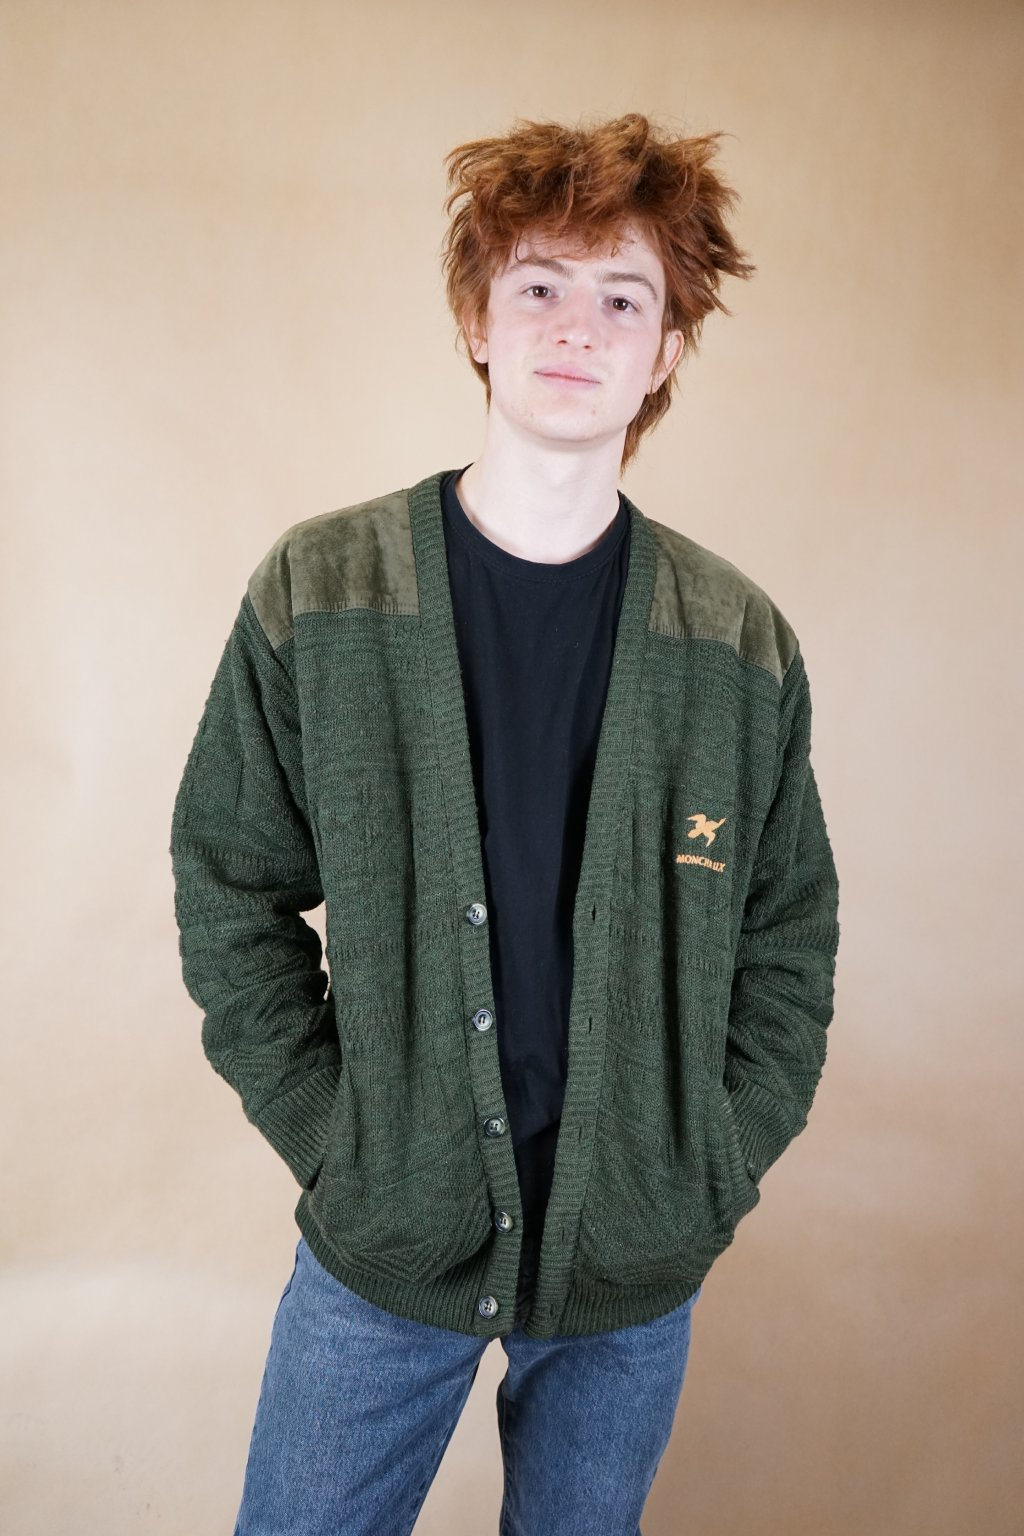 Zelený trachtový svetr/bunda vel. L